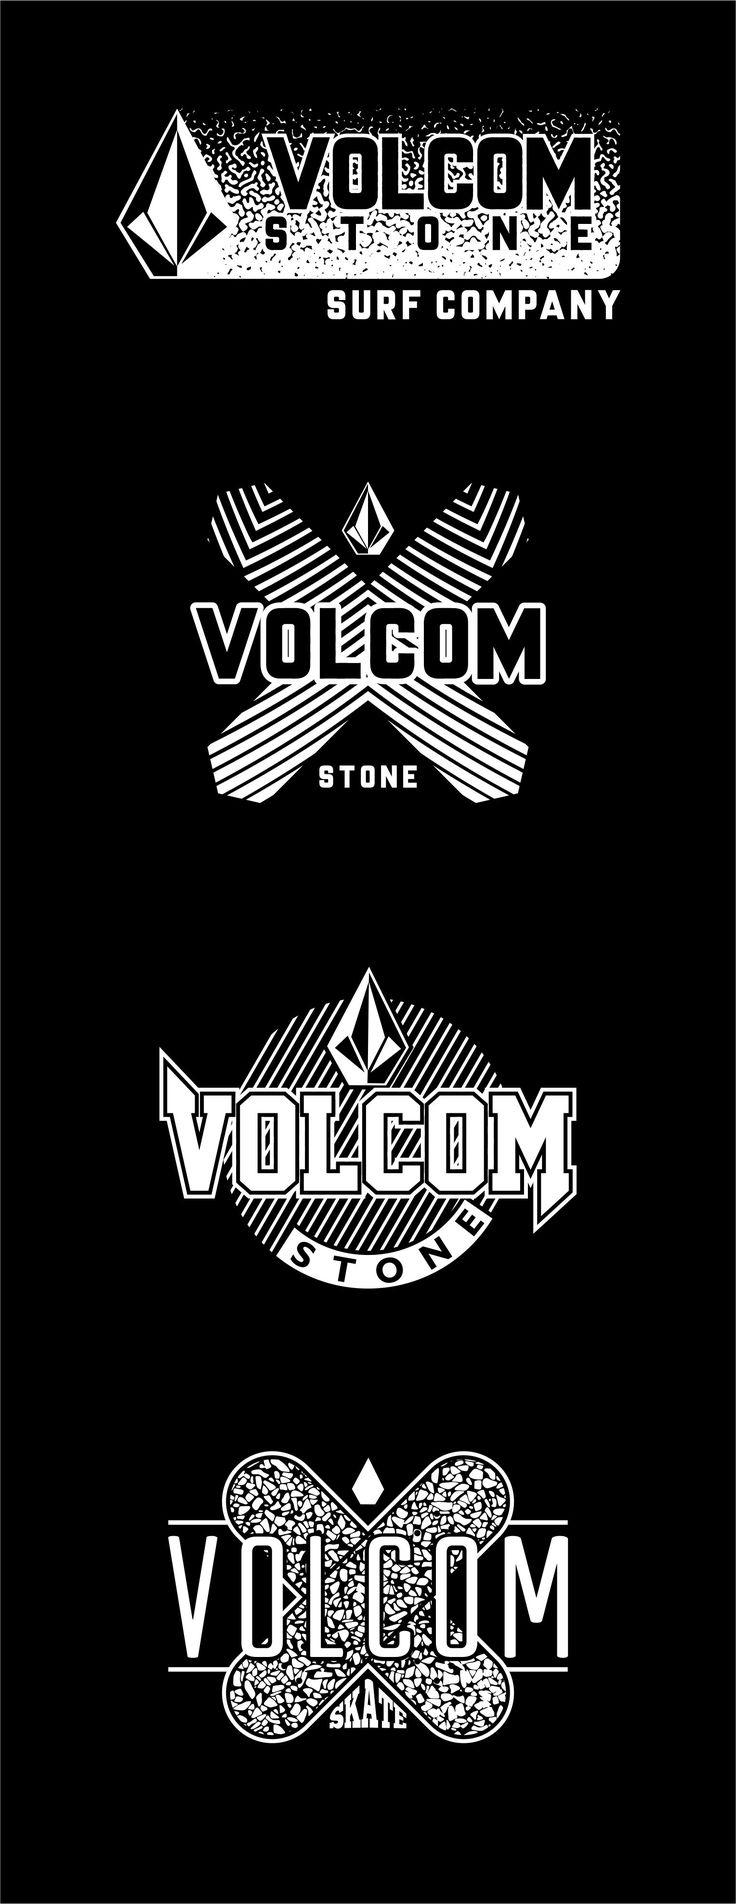 Vintage Vector volcom #vintage #vector #vectorsurf #vintagevector #volcom #adidas #billabong #rusty #nike #puma #levis #quiksilver #ripcurl #dc #vans #spyderbilt #reebok